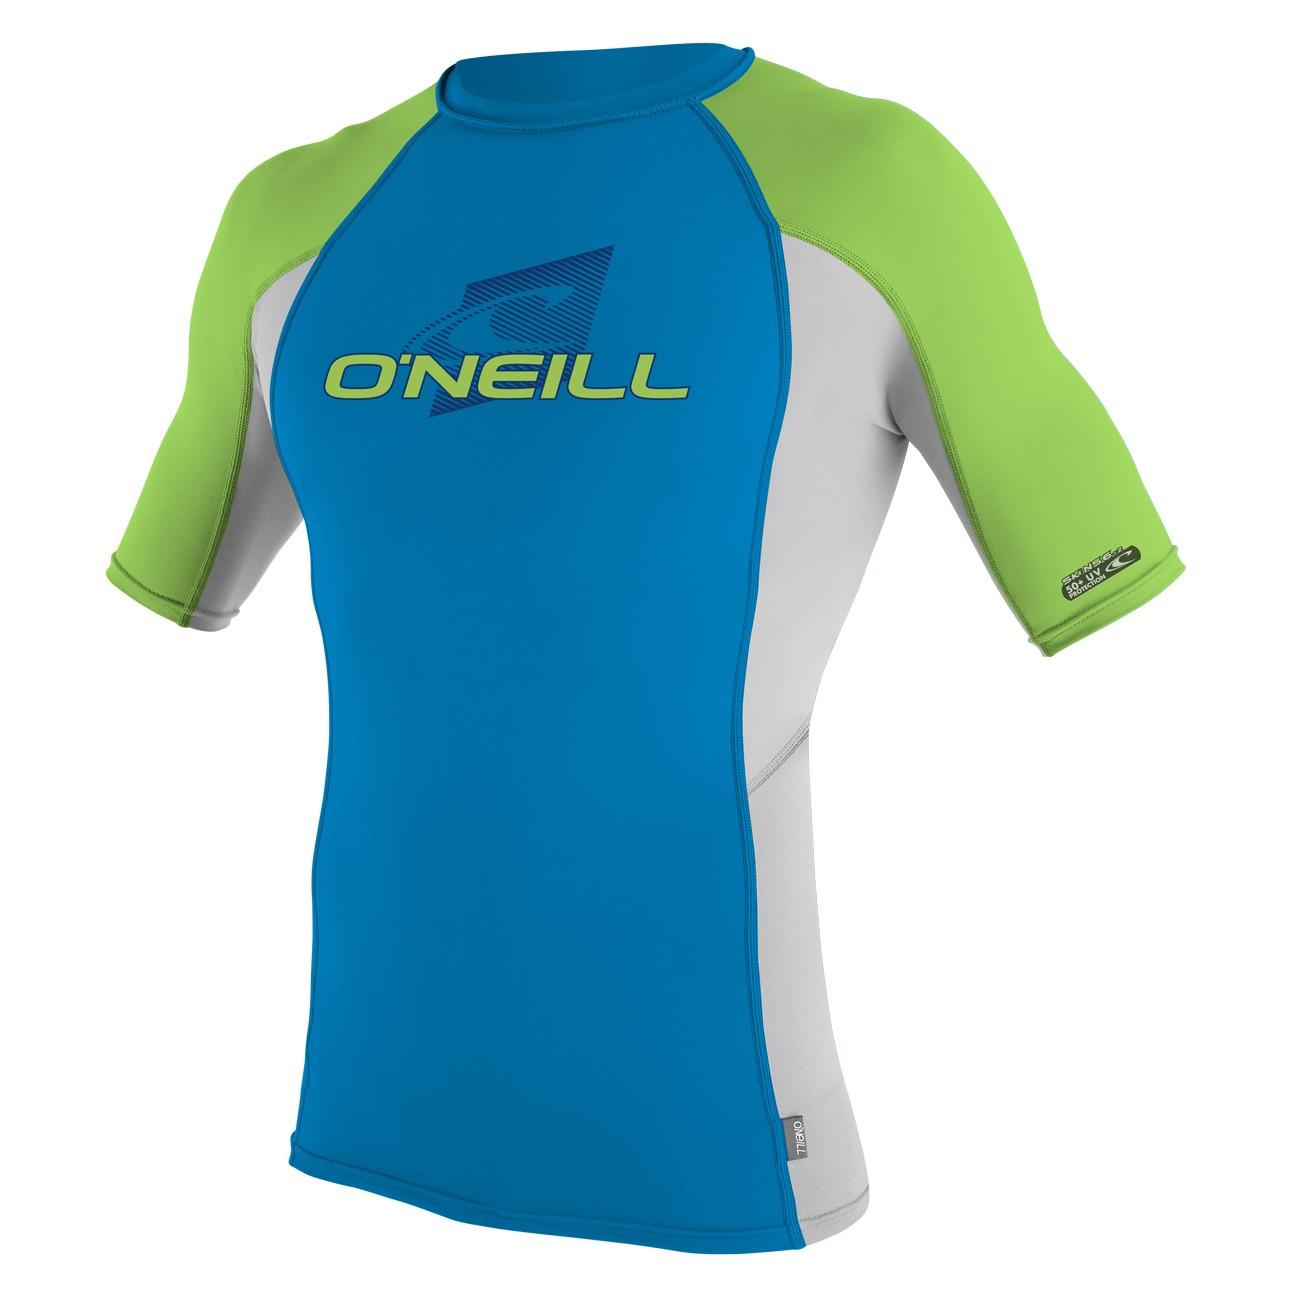 O'Neill Skins Crew Tight Fit +50 UPF Short Sleeved Rashguard (Youth)